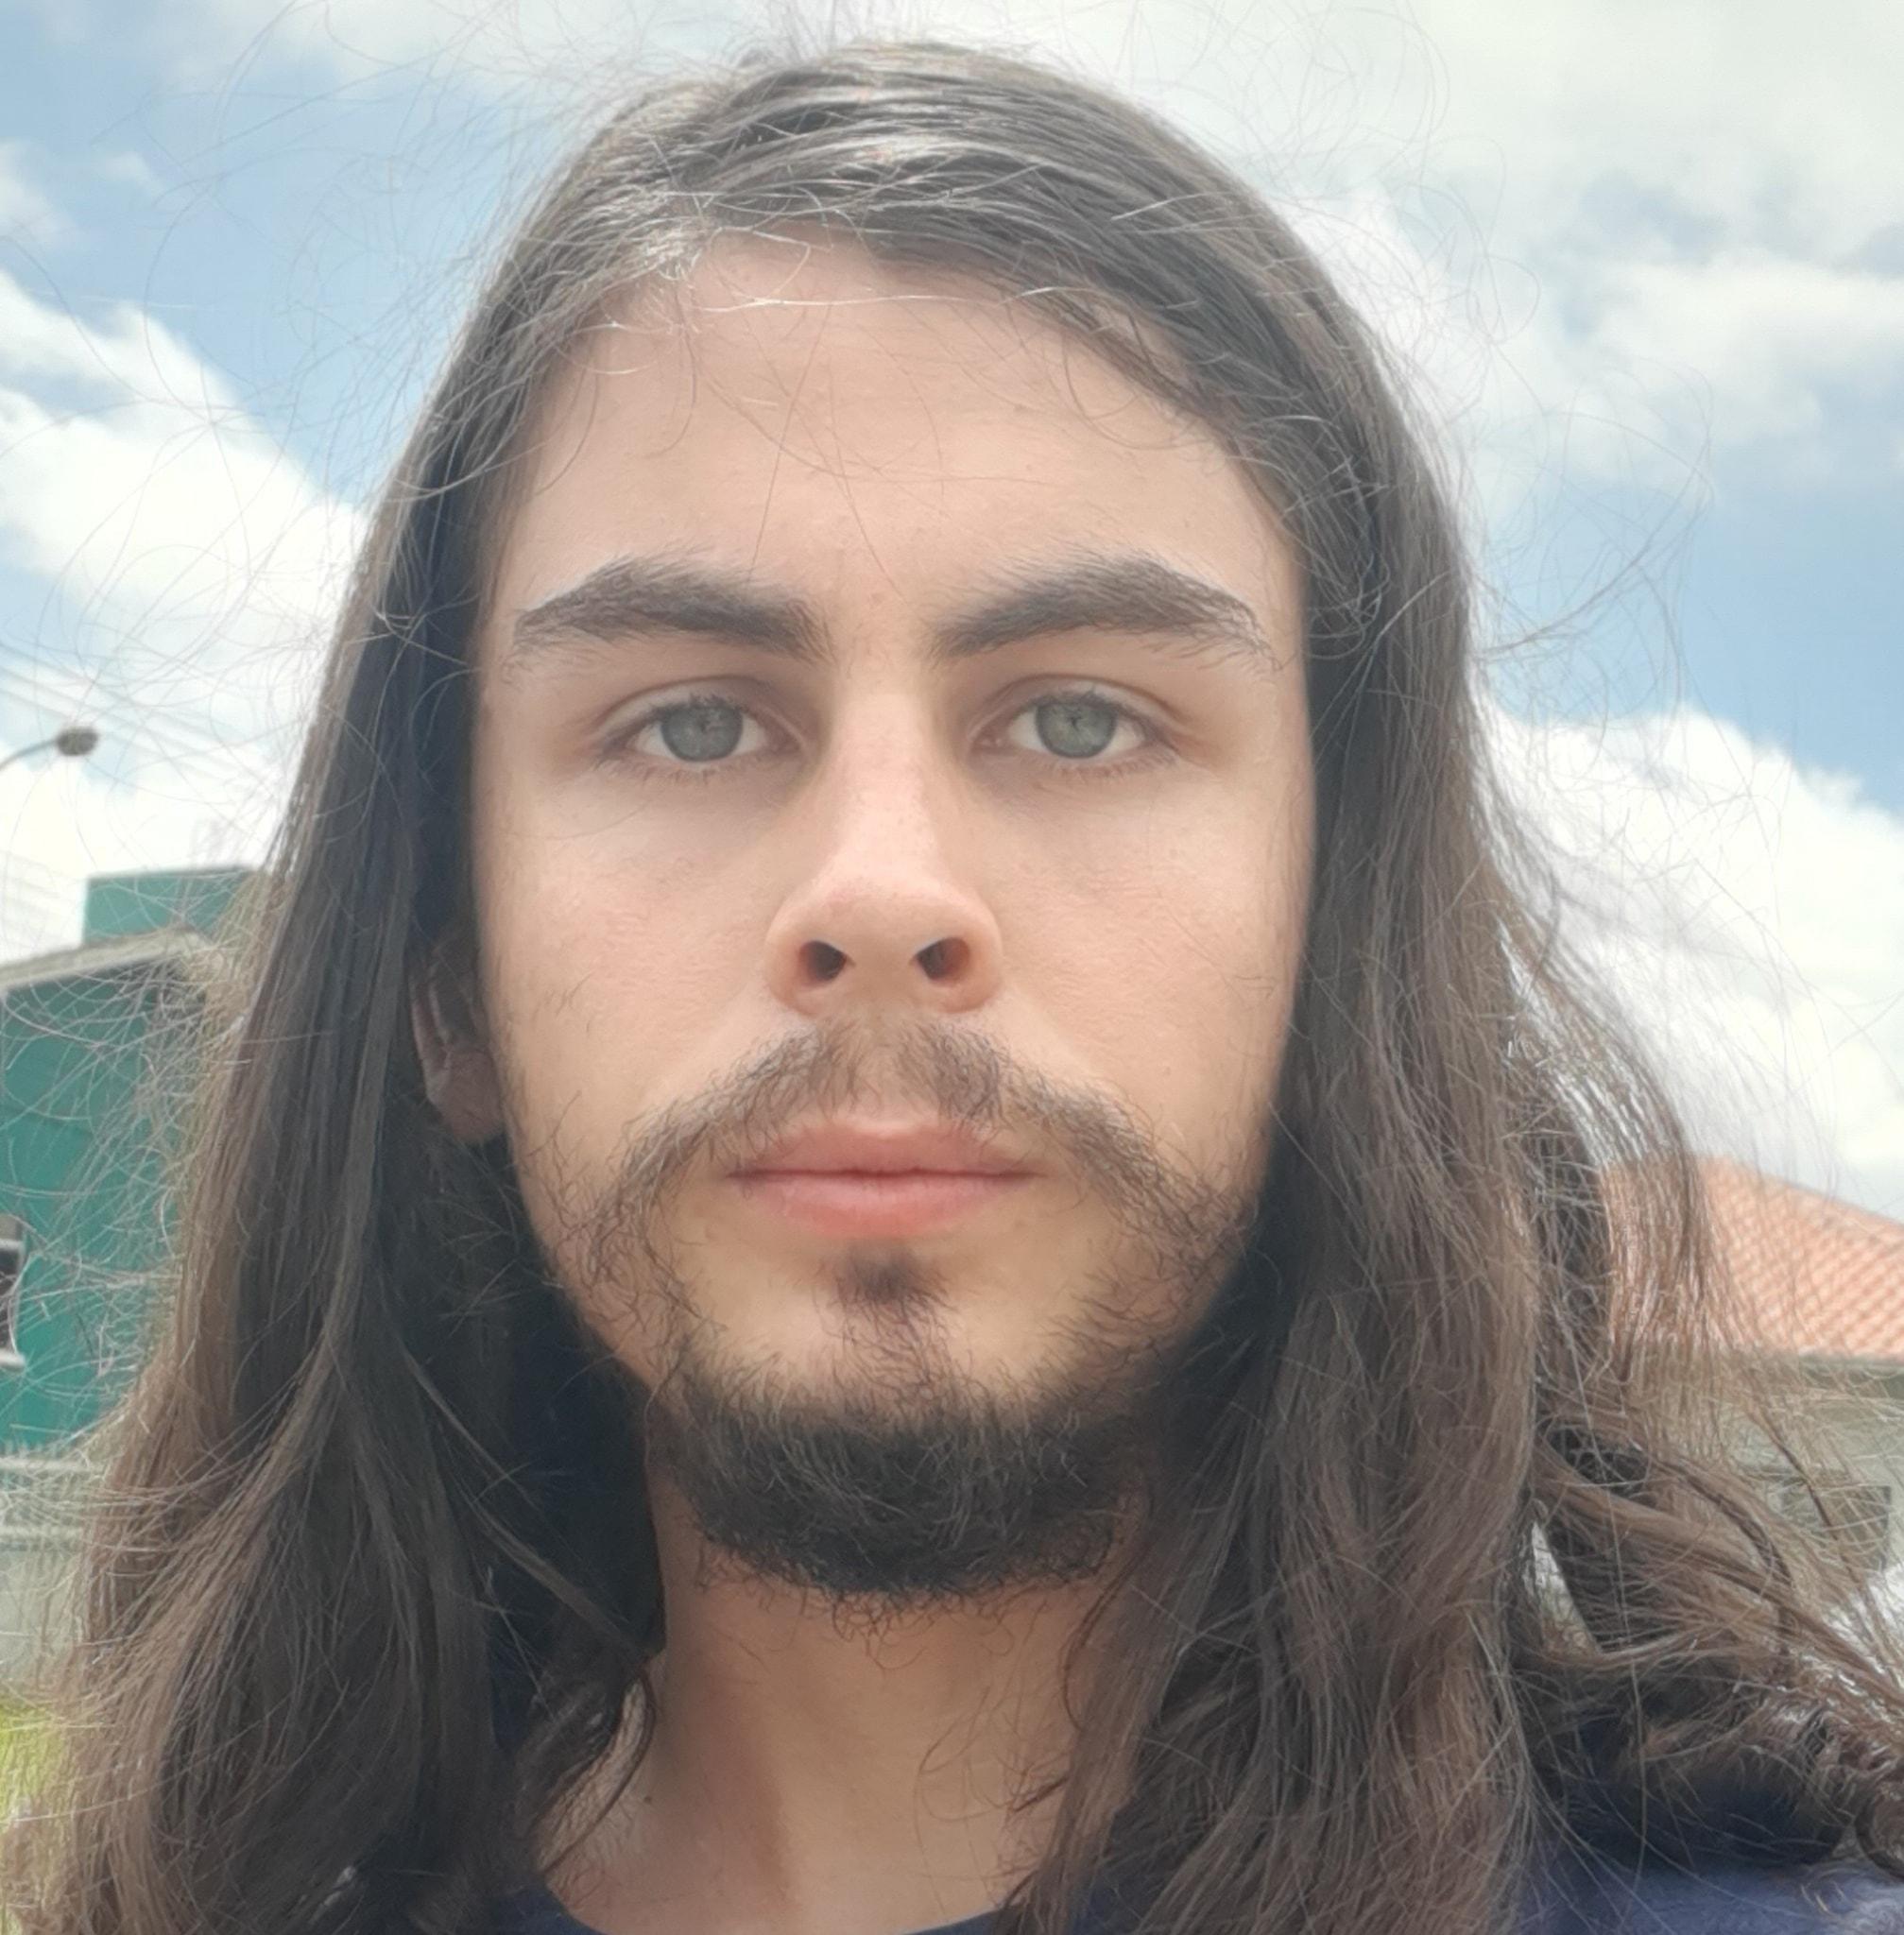 João Gebauer